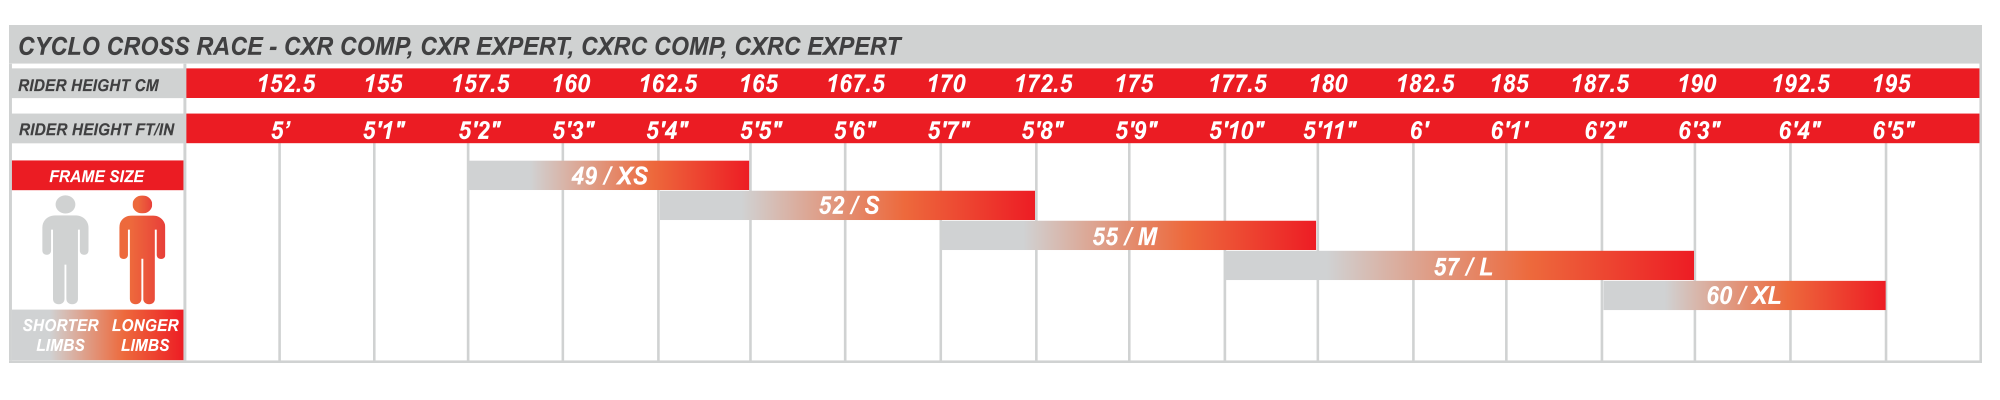 geo-size-chart-cross-race-2018.png